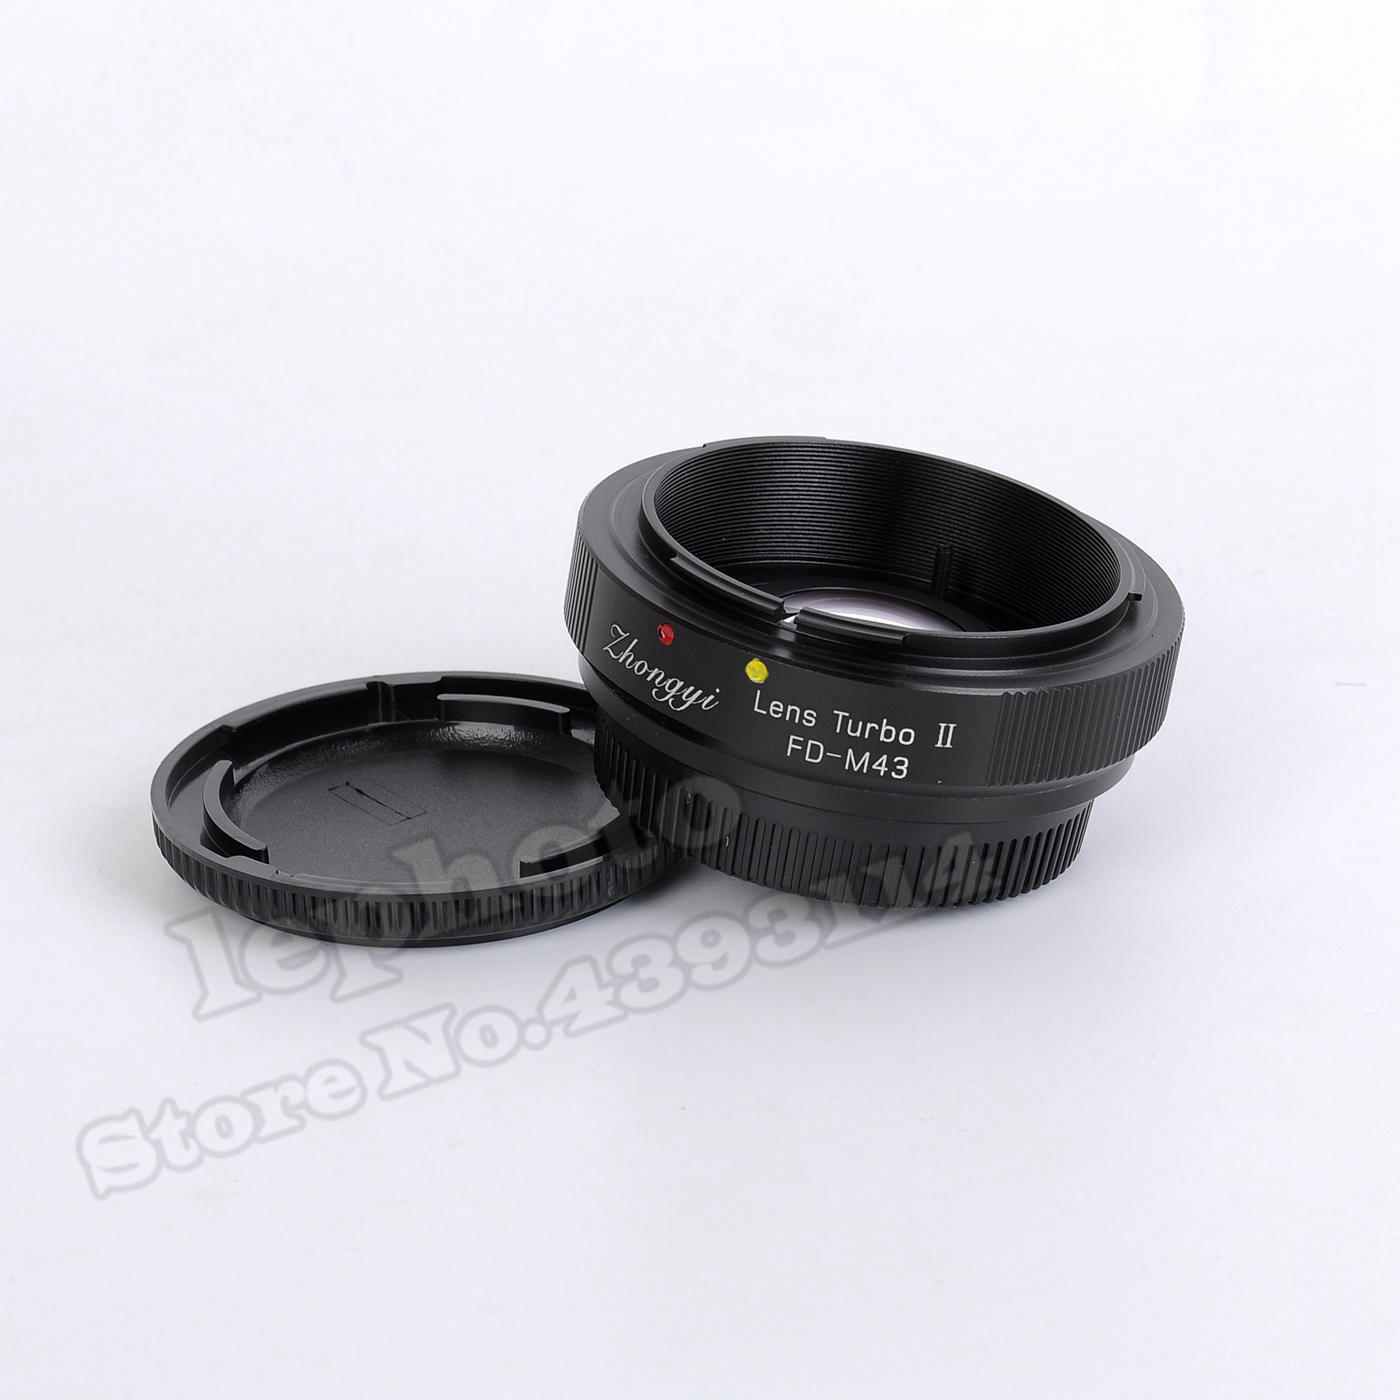 Mitakon Zhongyi Lens Turbo II Focal Reducer Booster Adapter for Canon FD Mount Lens to Micro